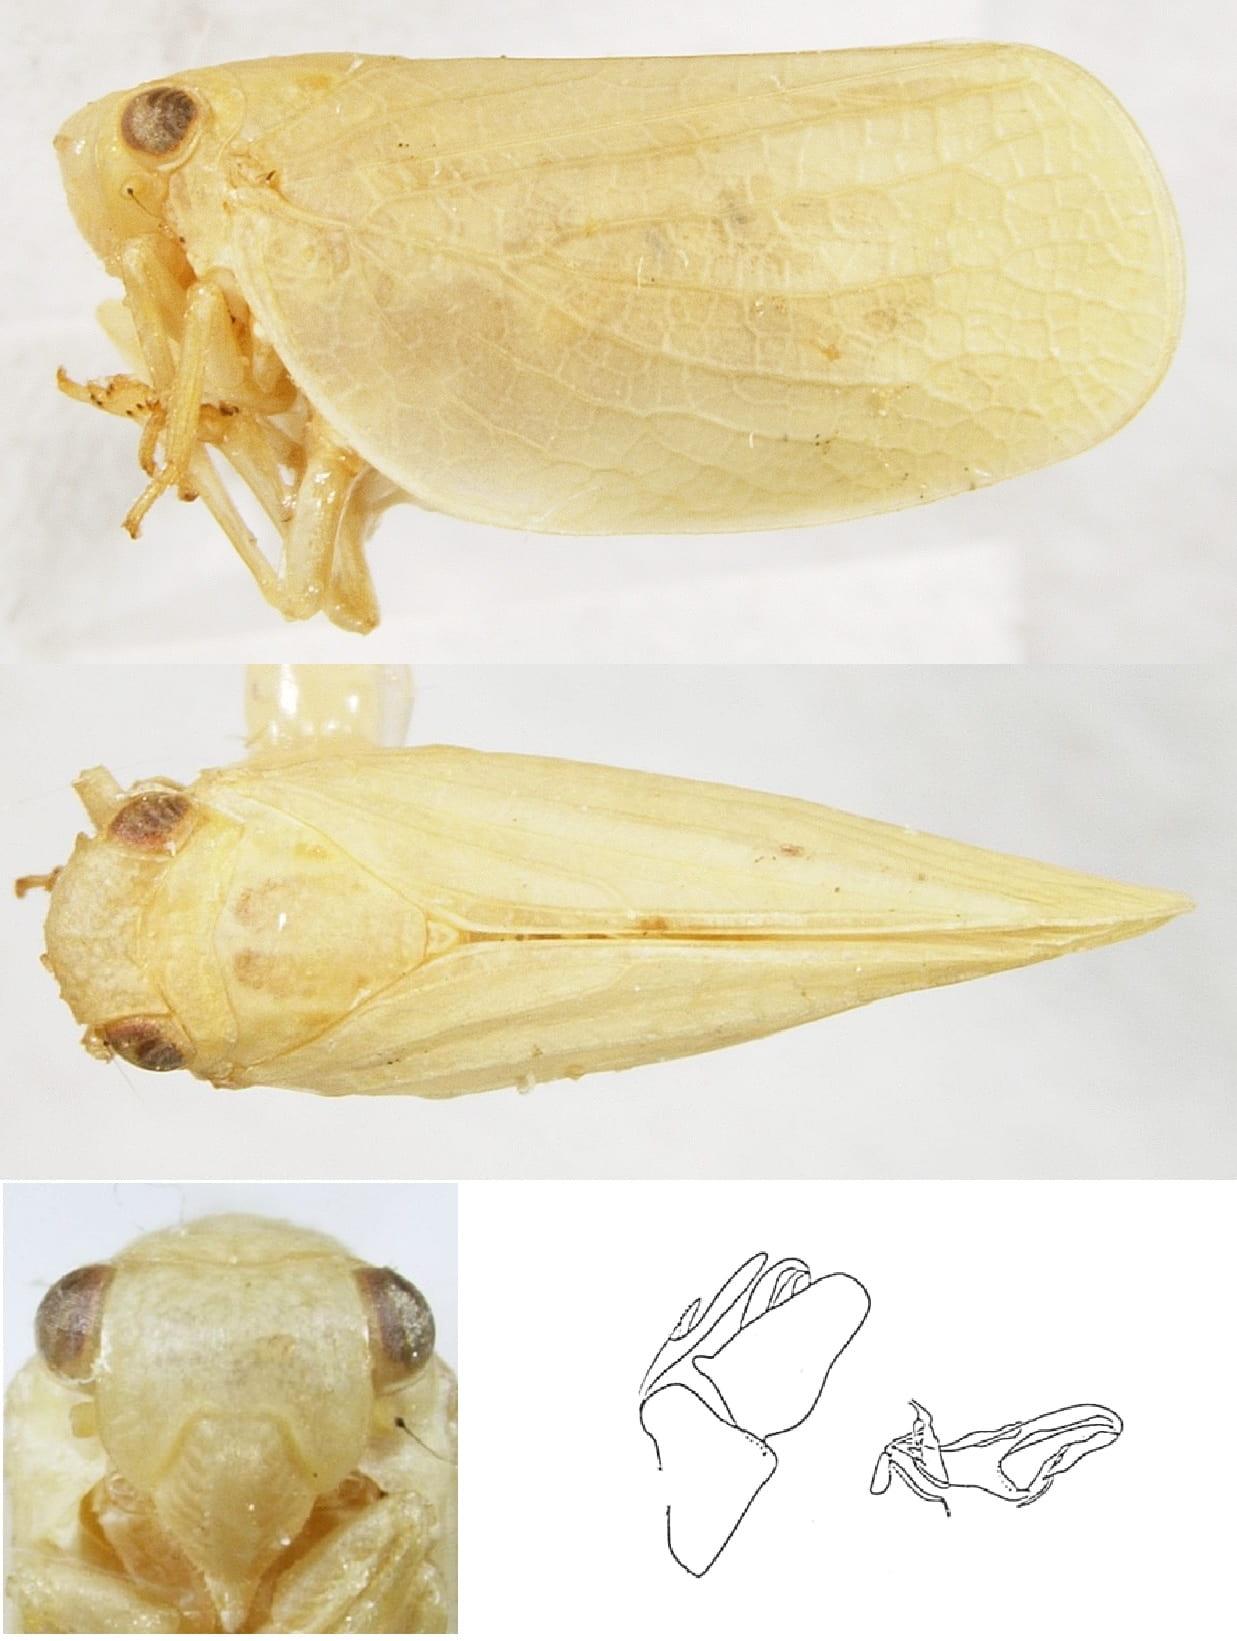 Acanalonia clypeata